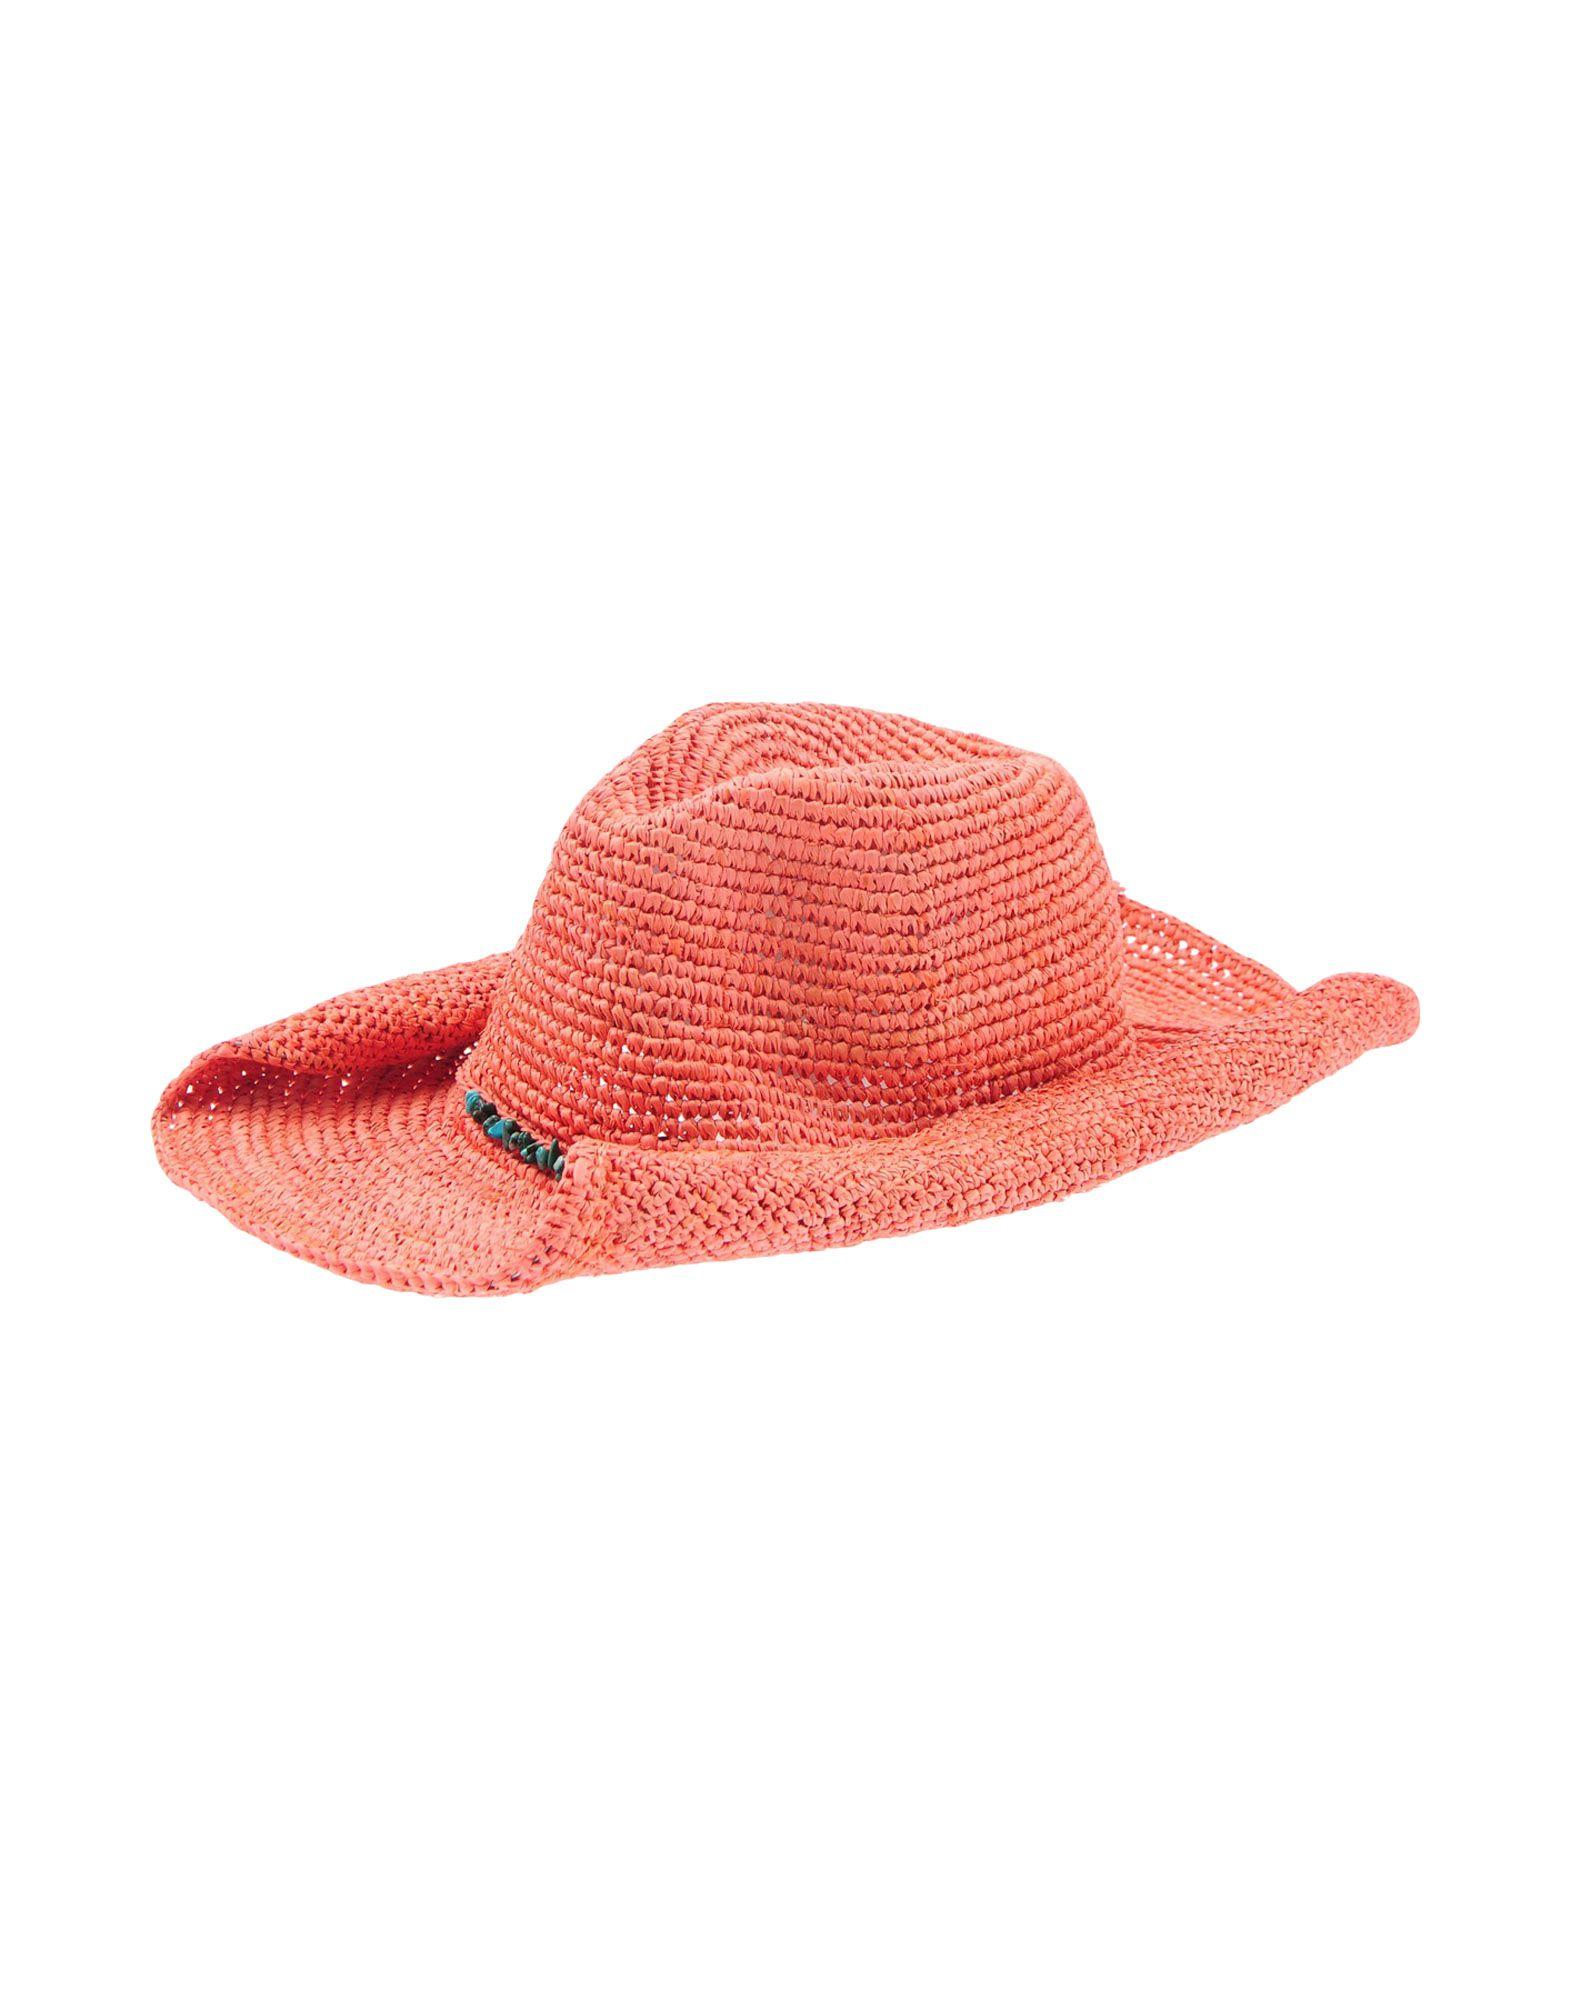 FLORABELLA Hat in Orange